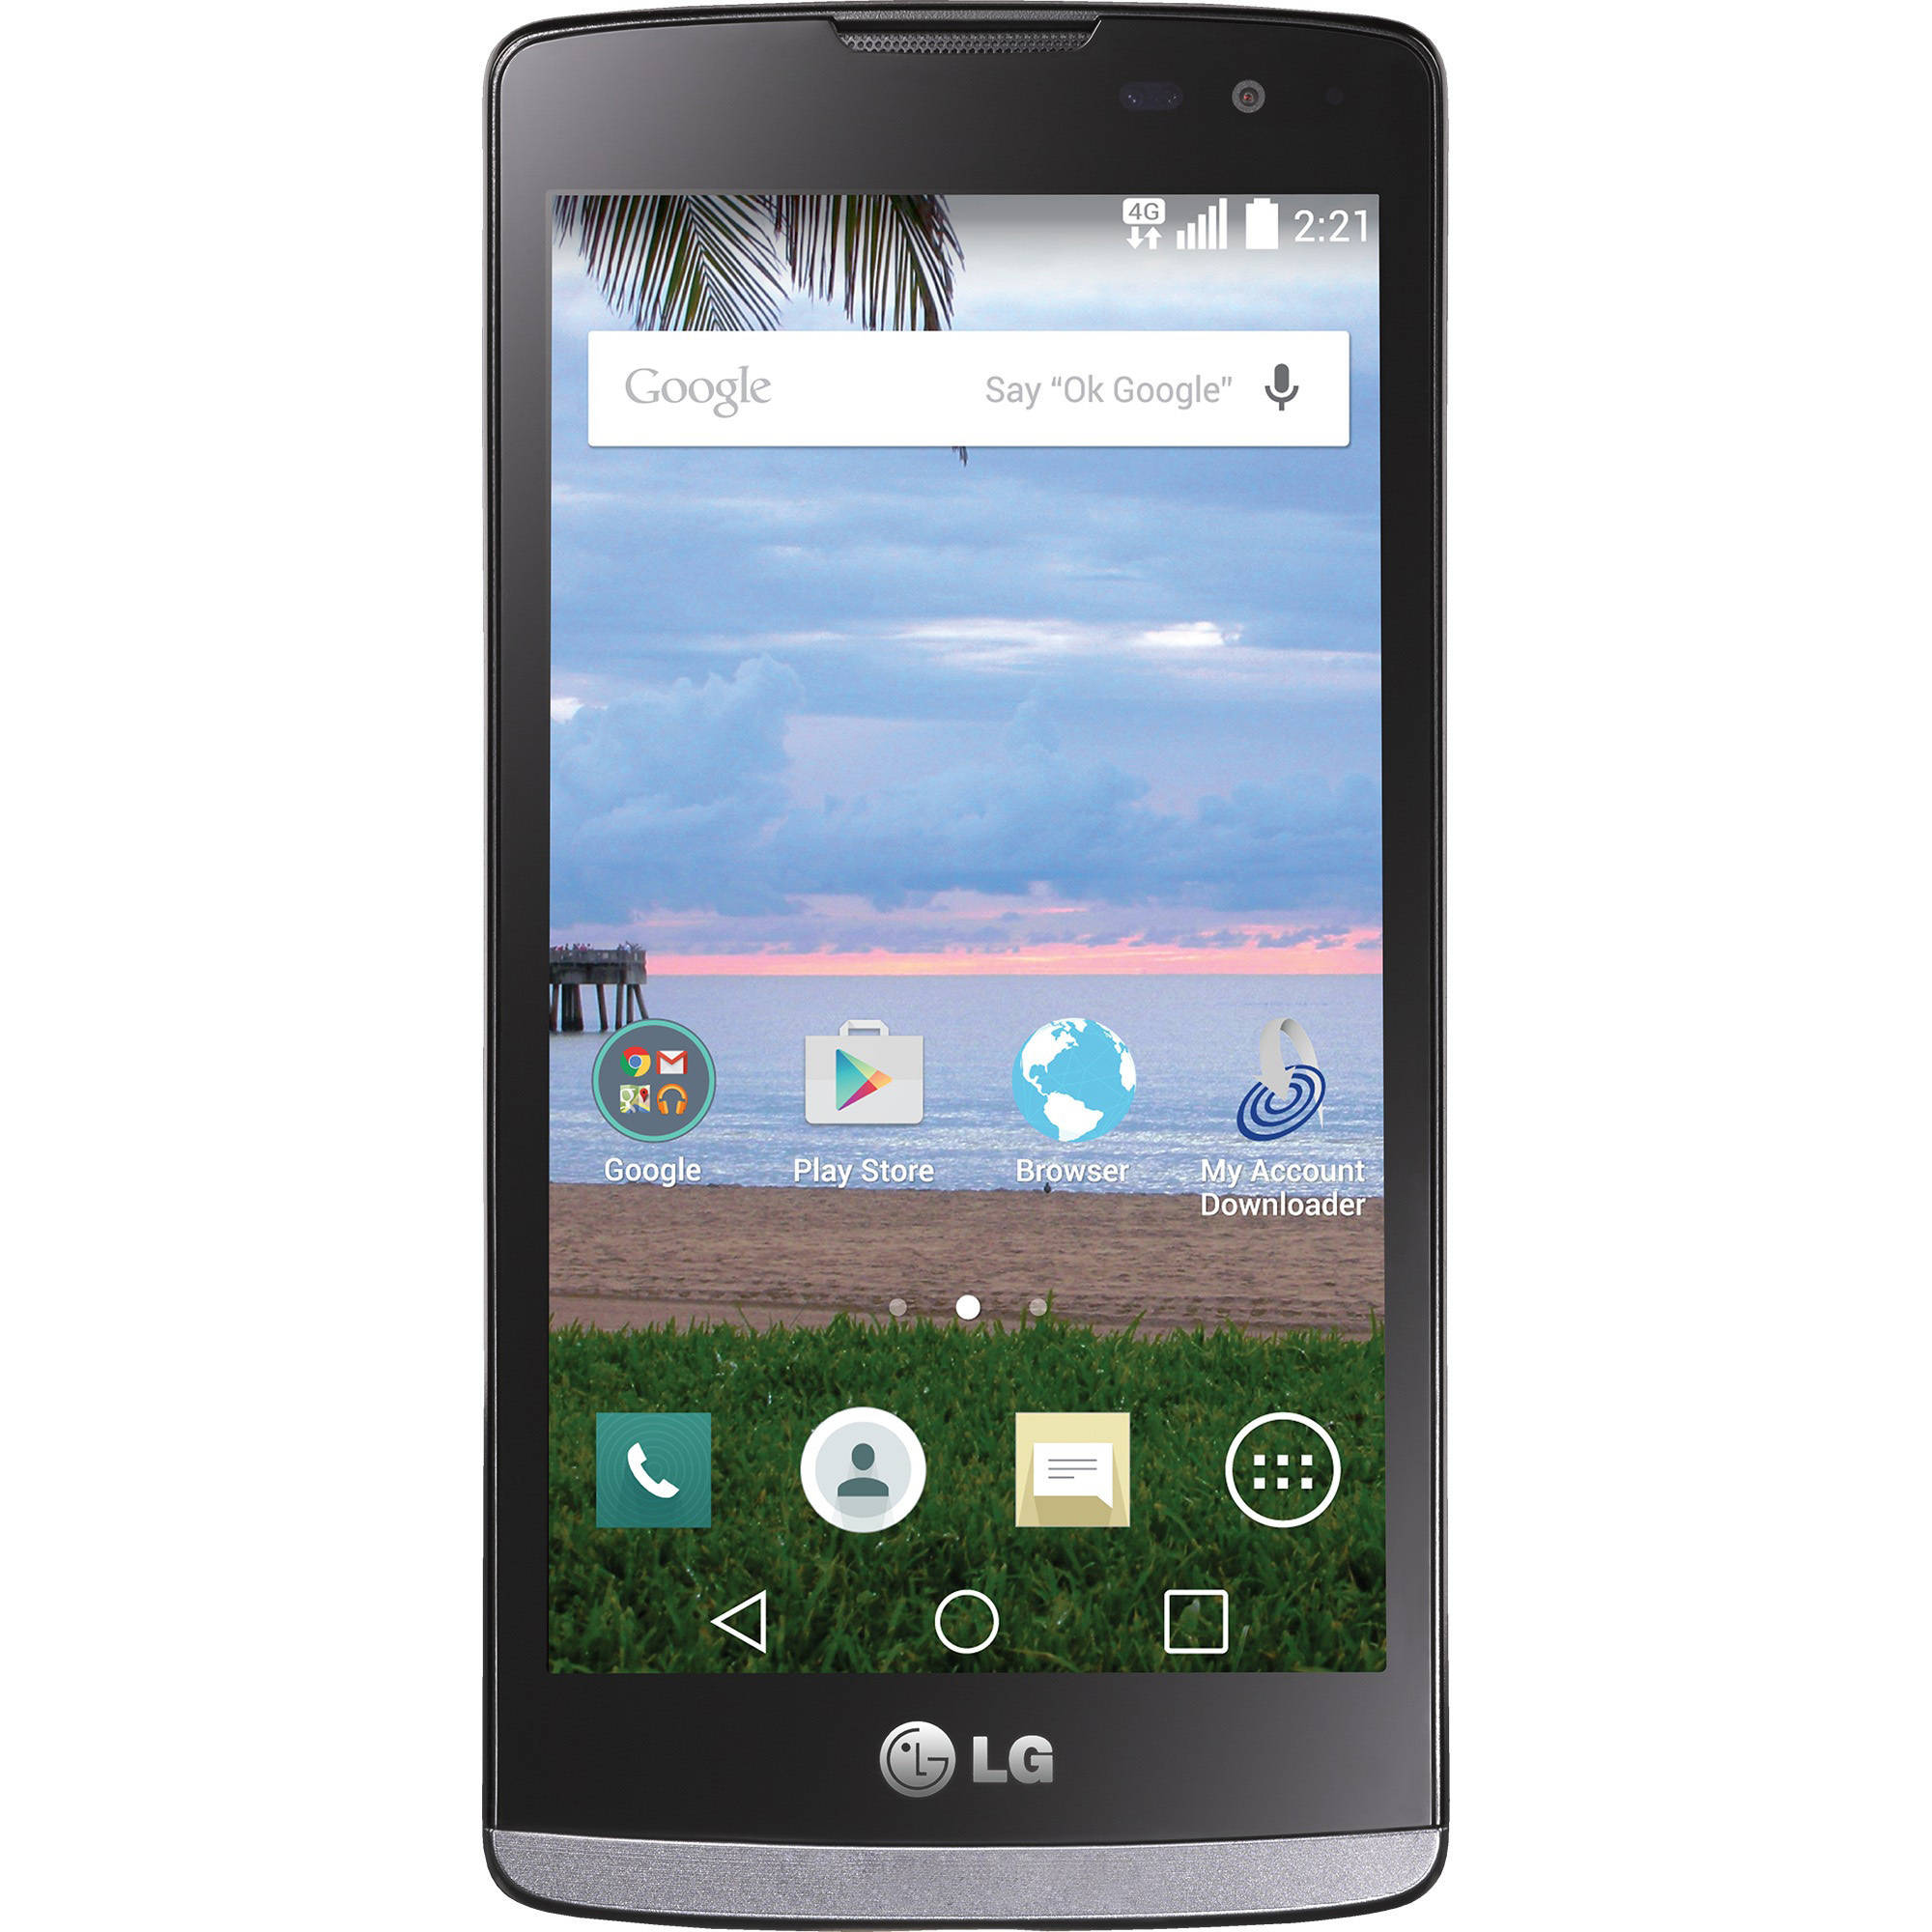 Refurbished Straight Talk LG Destiny 4G Prepaid Smartphone with a $45/30 Day Plan